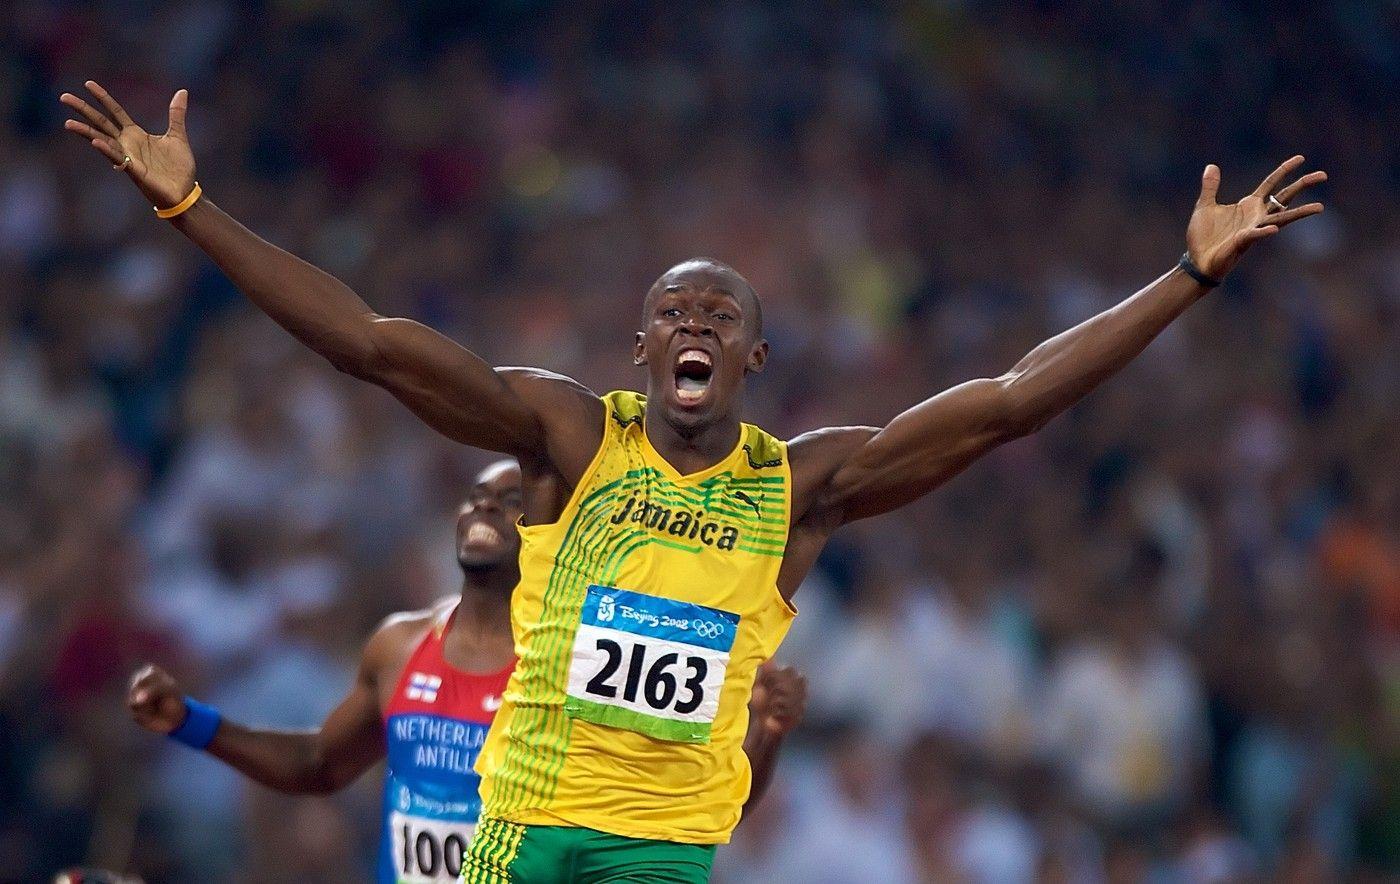 Usain Bolt Wallpapers 2015 Olympics - Wallpaper Cave